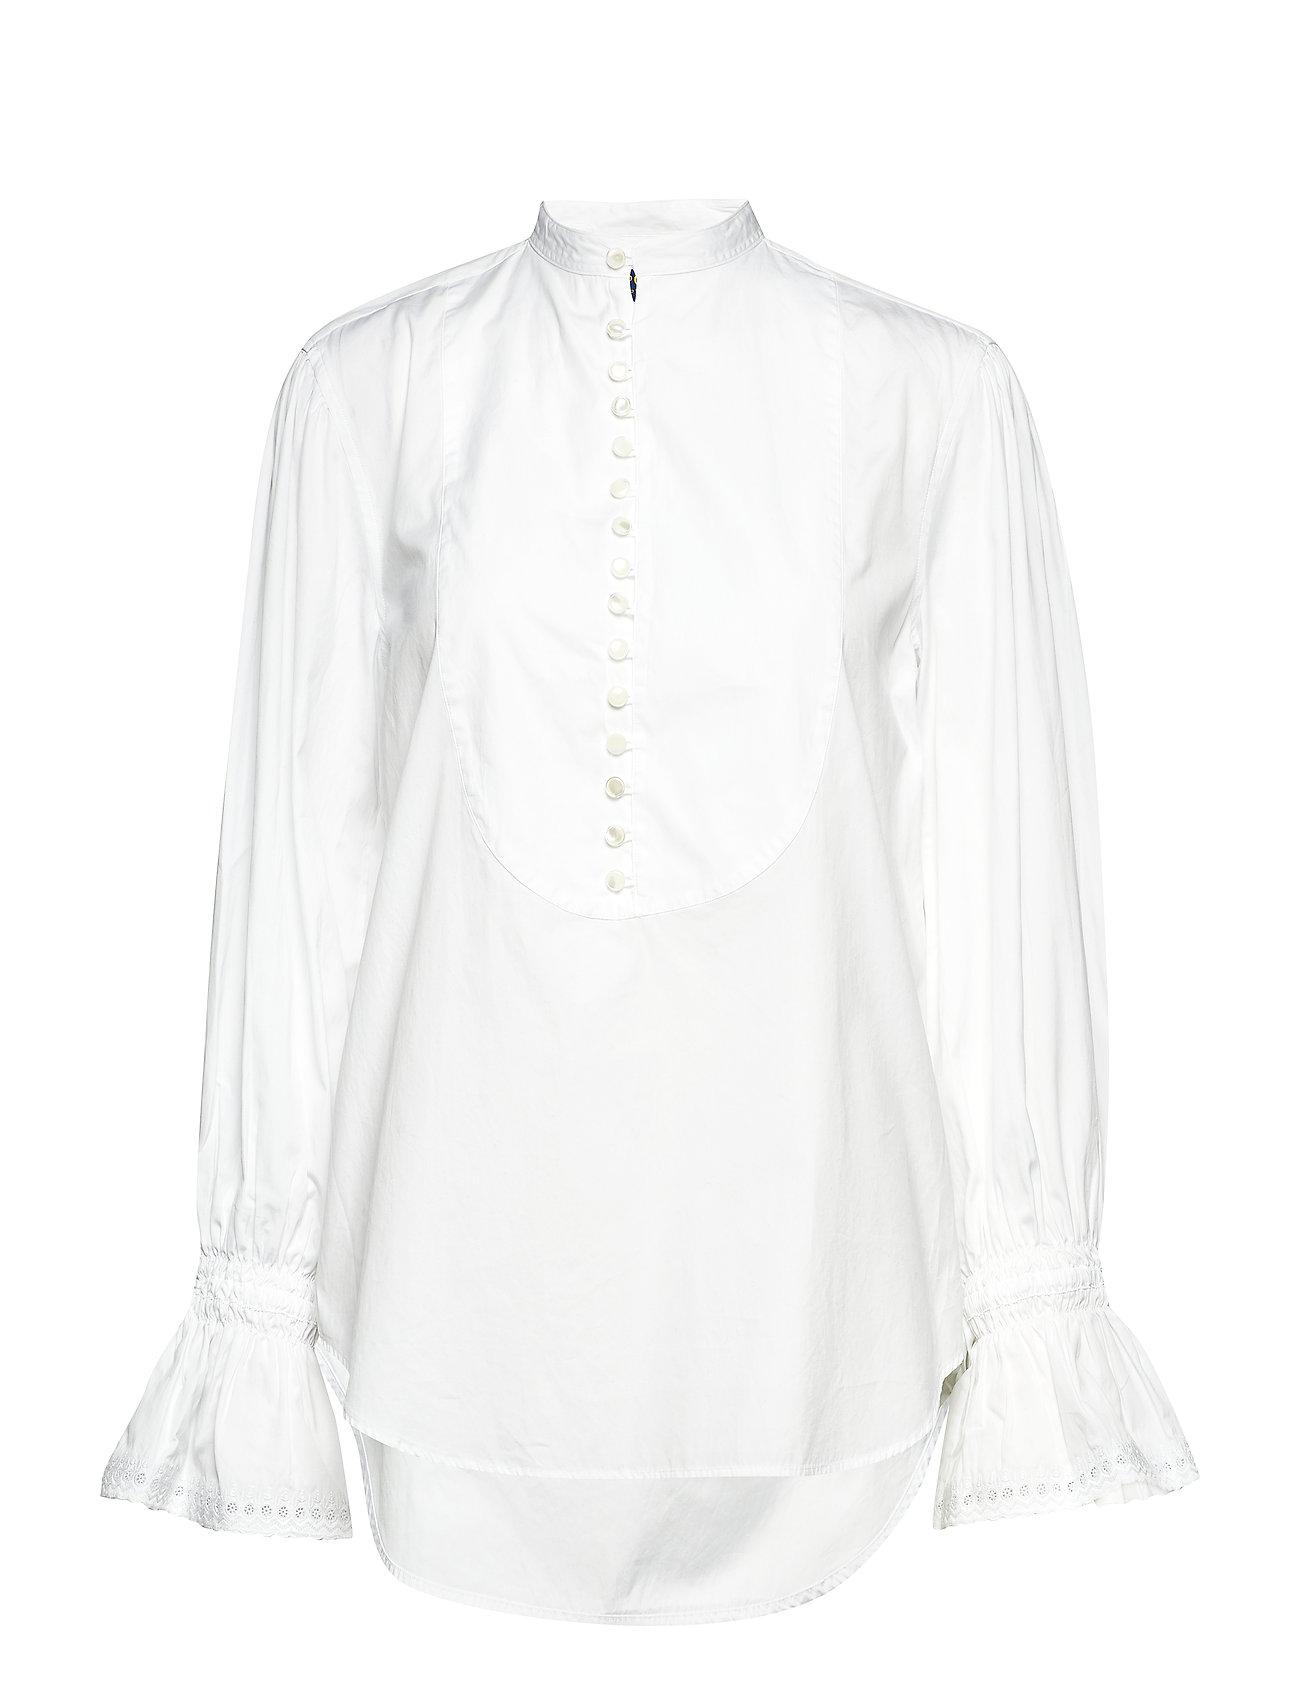 Polo Ralph Lauren Cotton Broadcloth Top